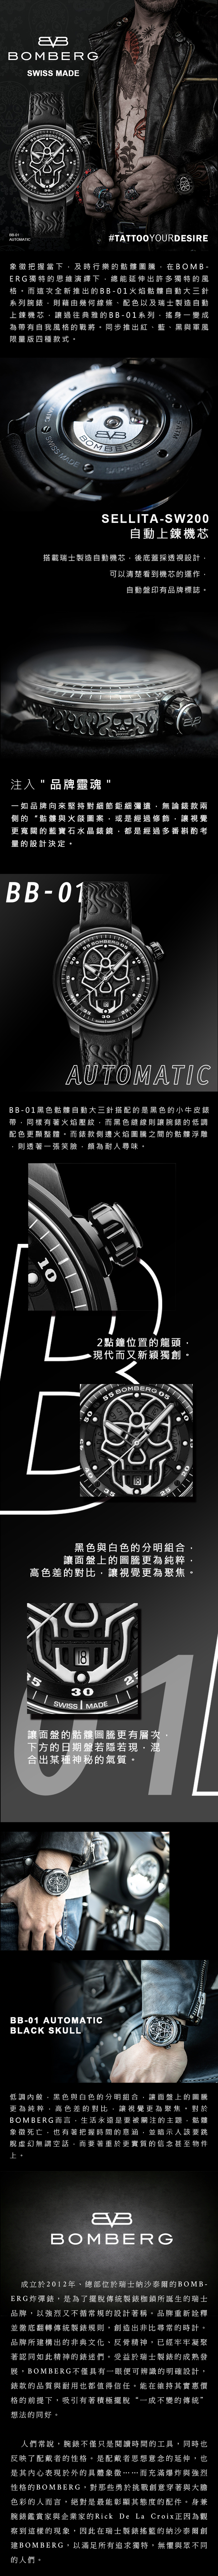 BOMBERG|BB-01 自動機械系列 黑色火焰骷髏自動大三針-錶徑 43mm